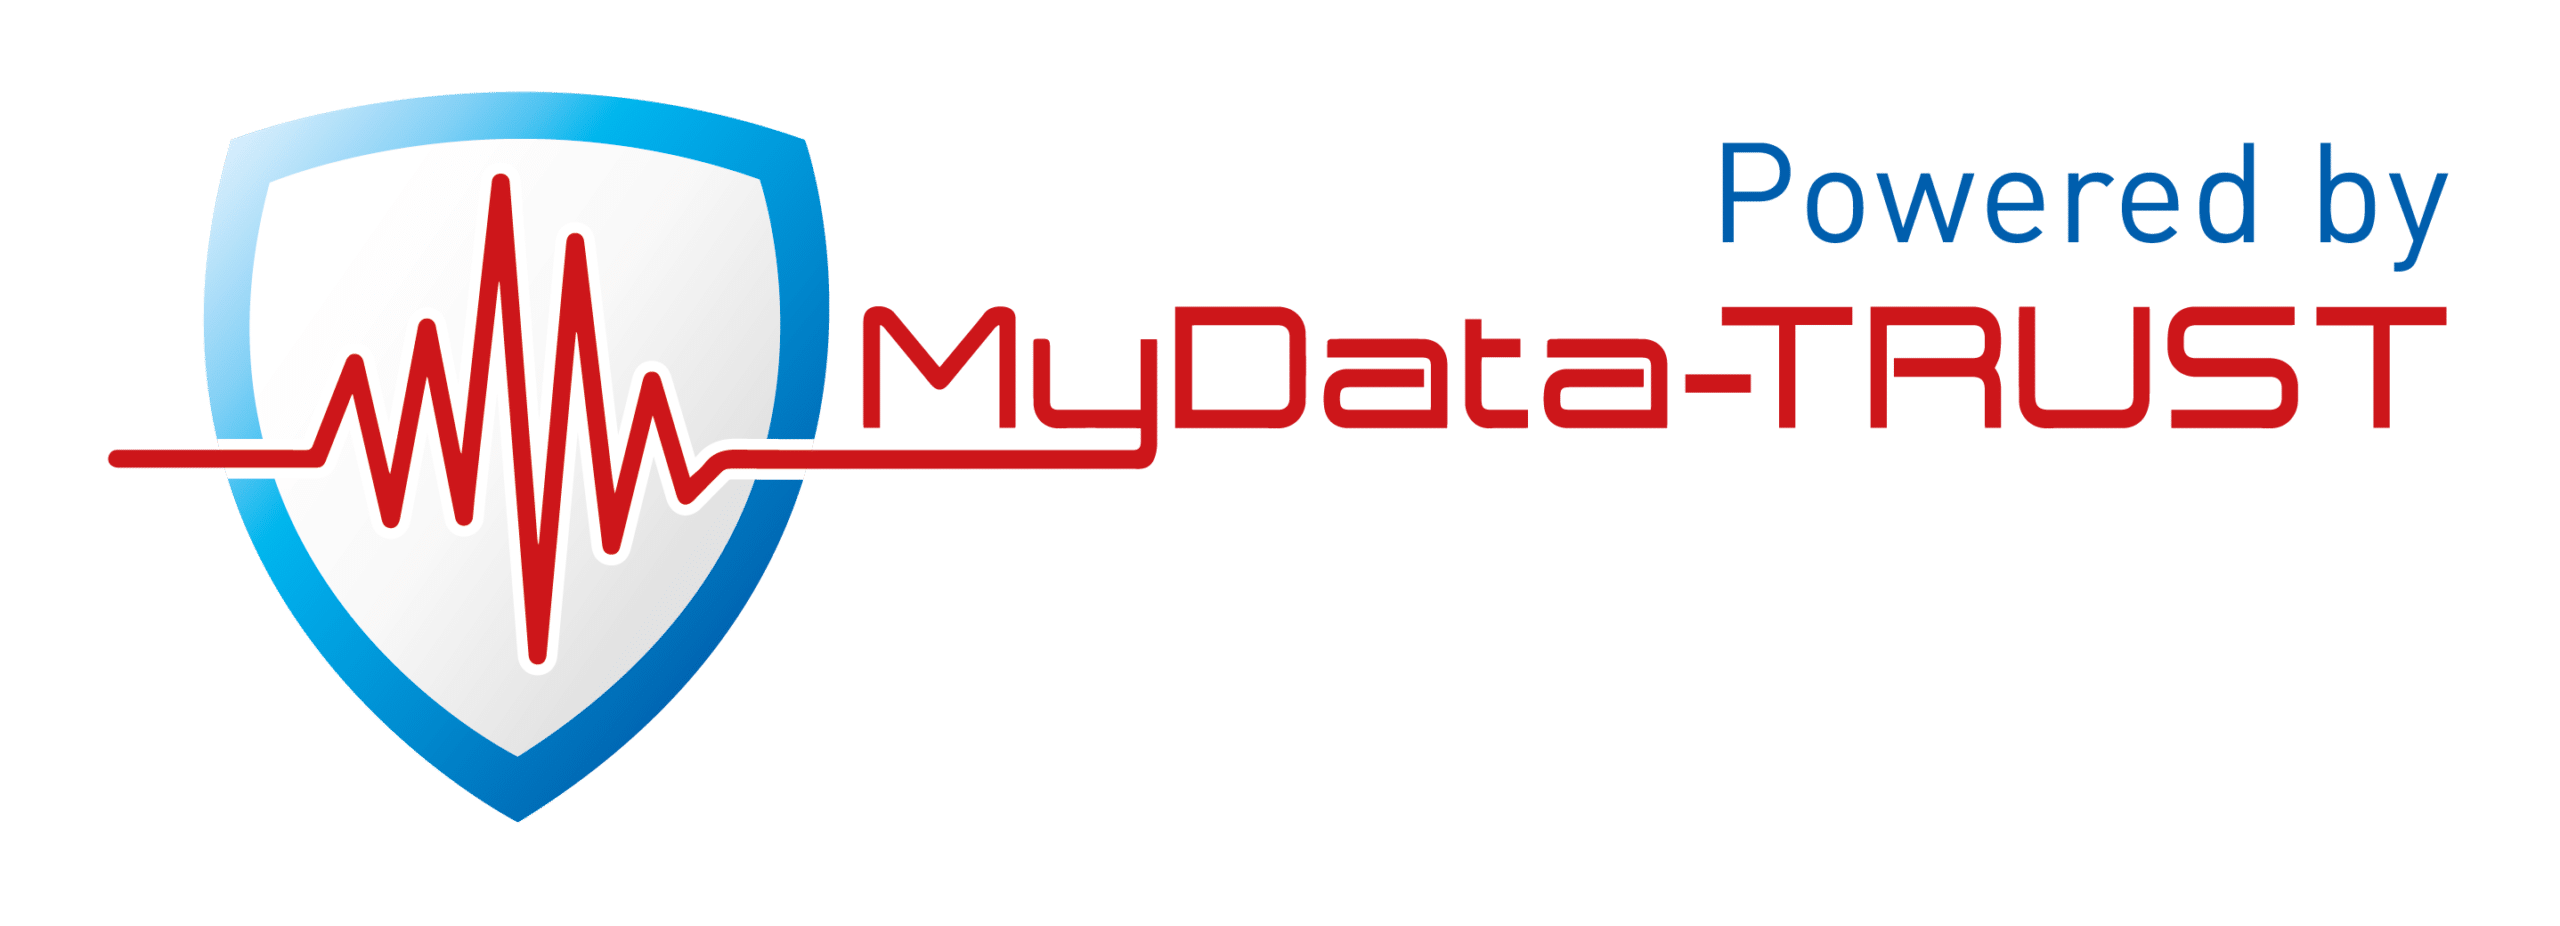 Powered by MyData-TRUST